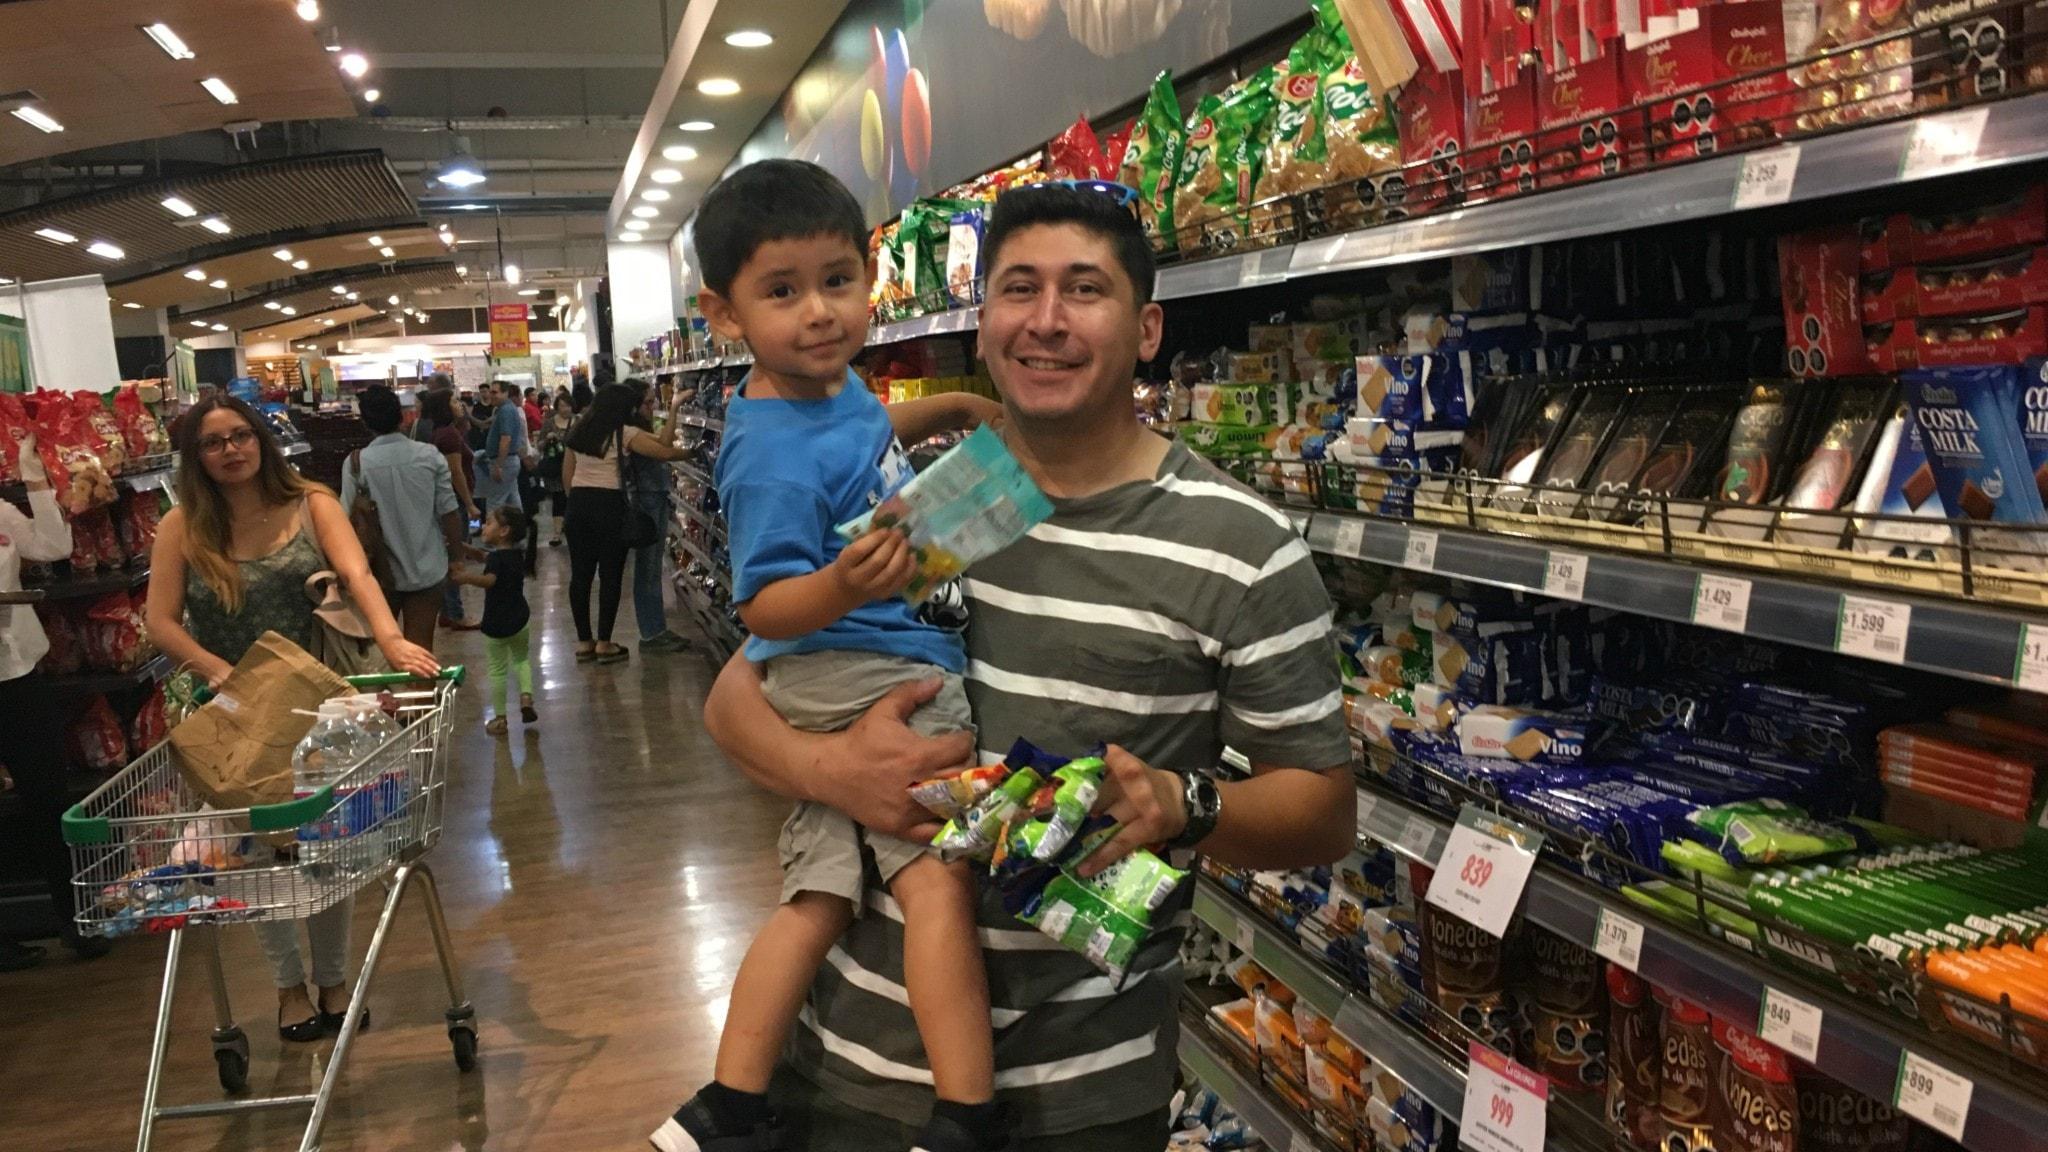 Andres Moreira med sin då 2-årige son i en matbutik